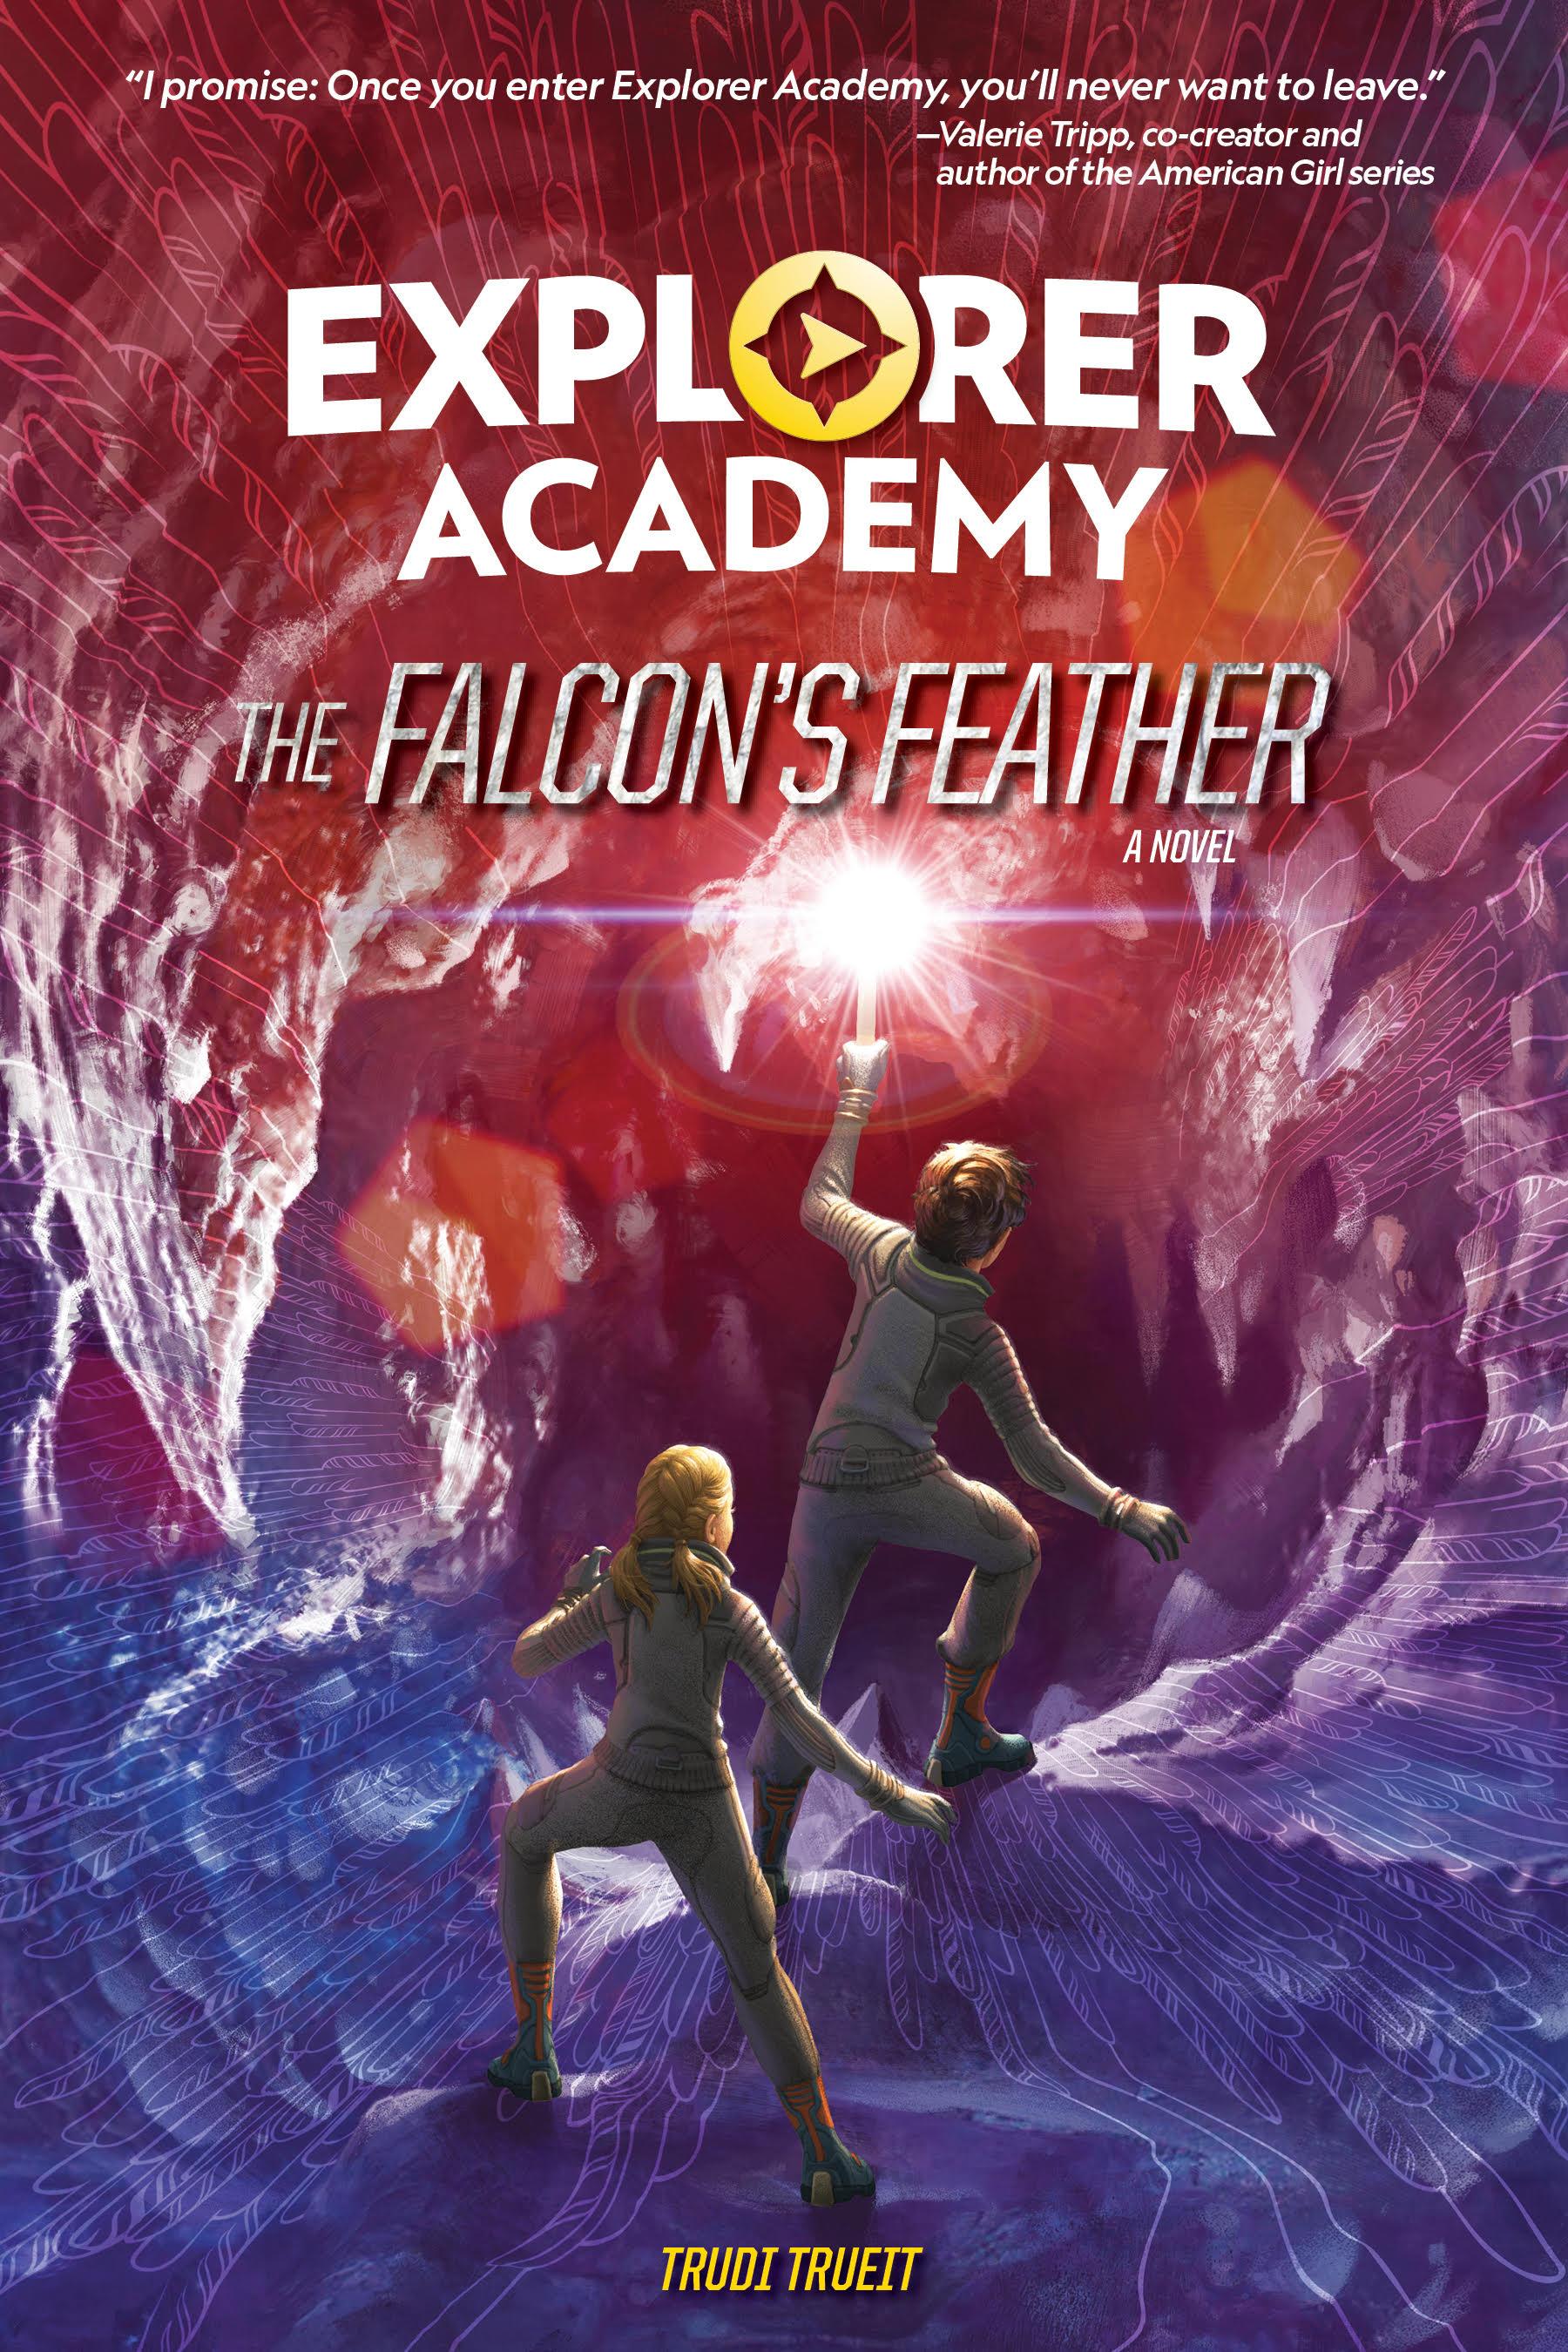 Explorer academy2.jpg